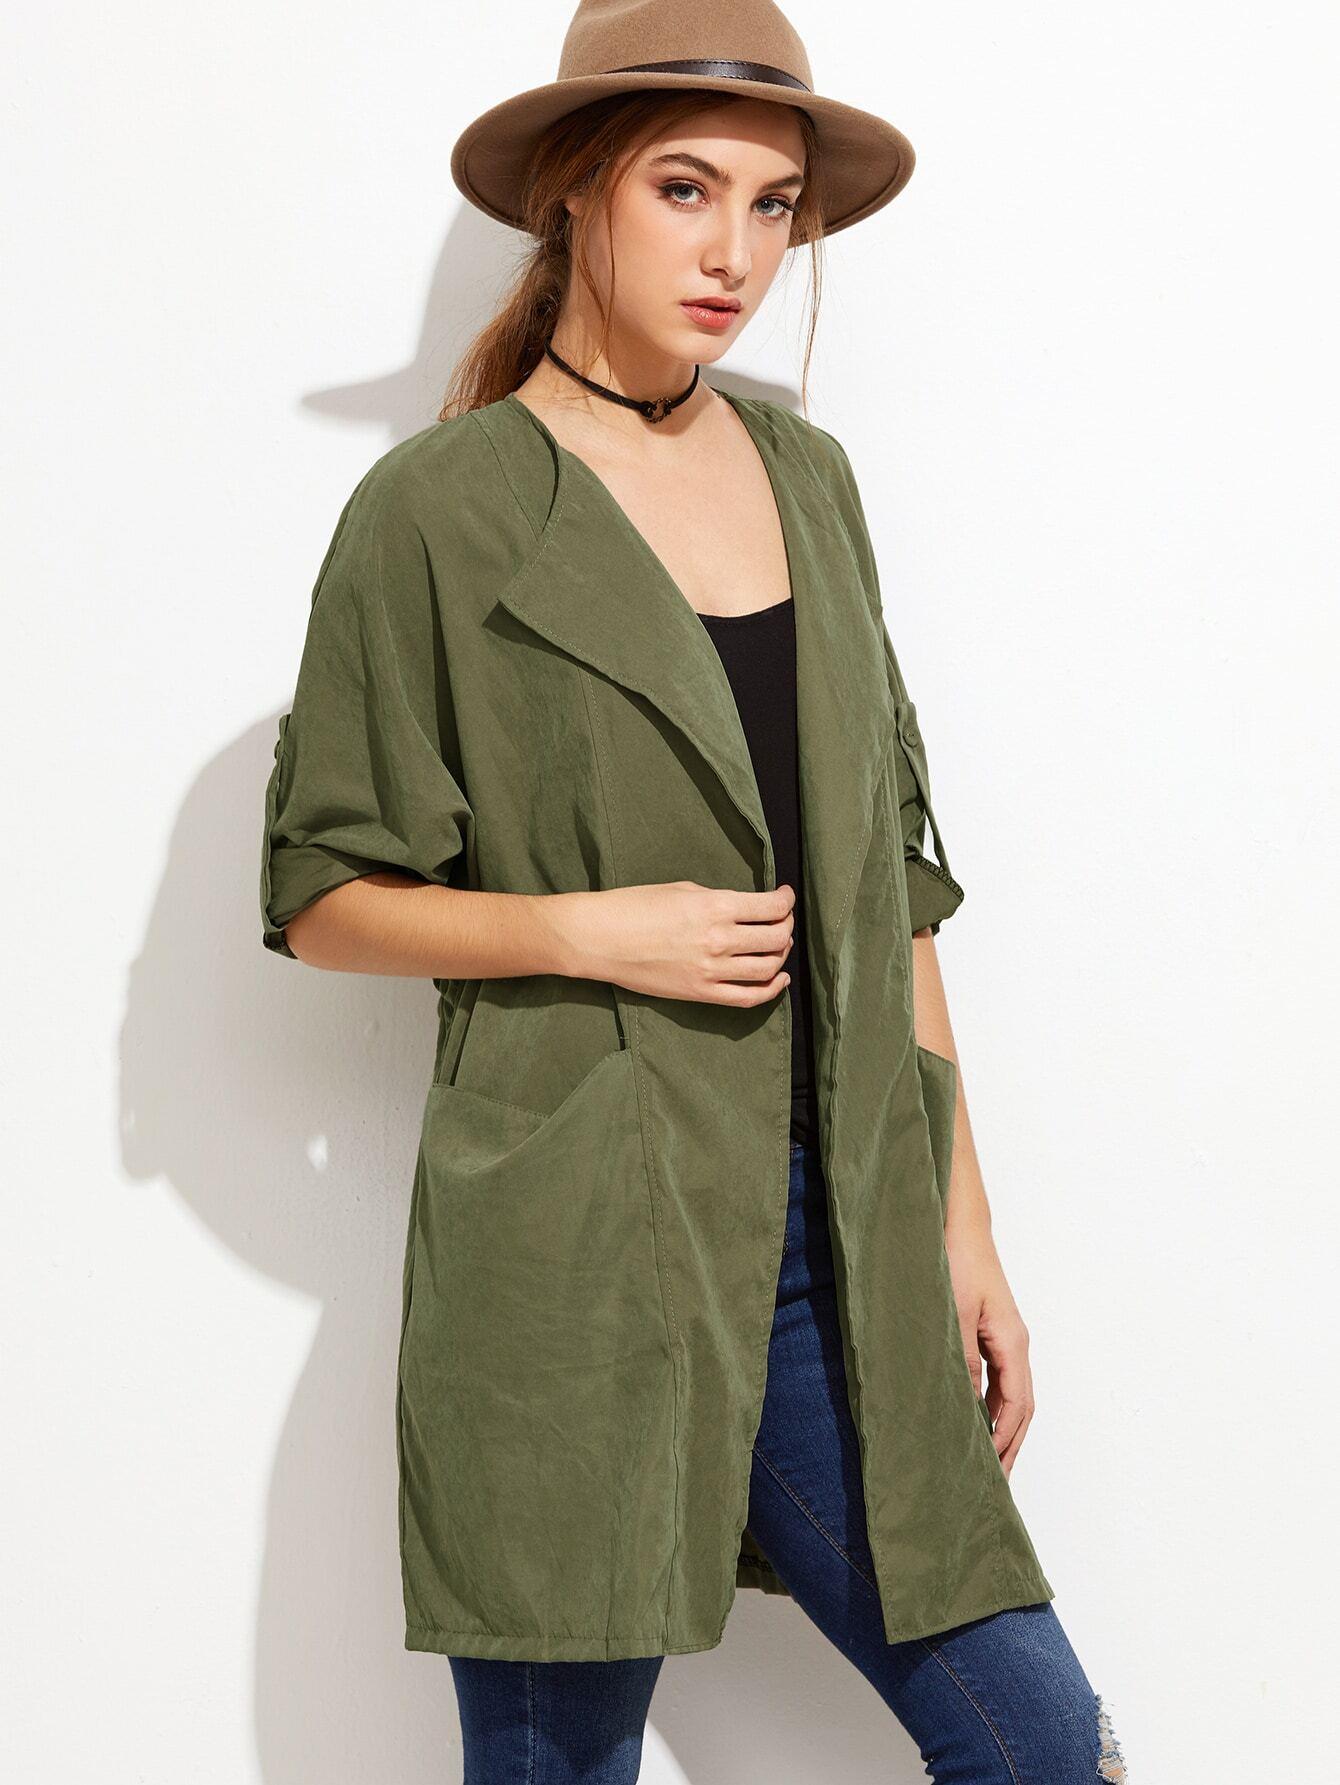 Army Green Roll Tab Sleeve Drawstring CoatArmy Green Roll Tab Sleeve Drawstring Coat<br><br>color: Green<br>size: one-size